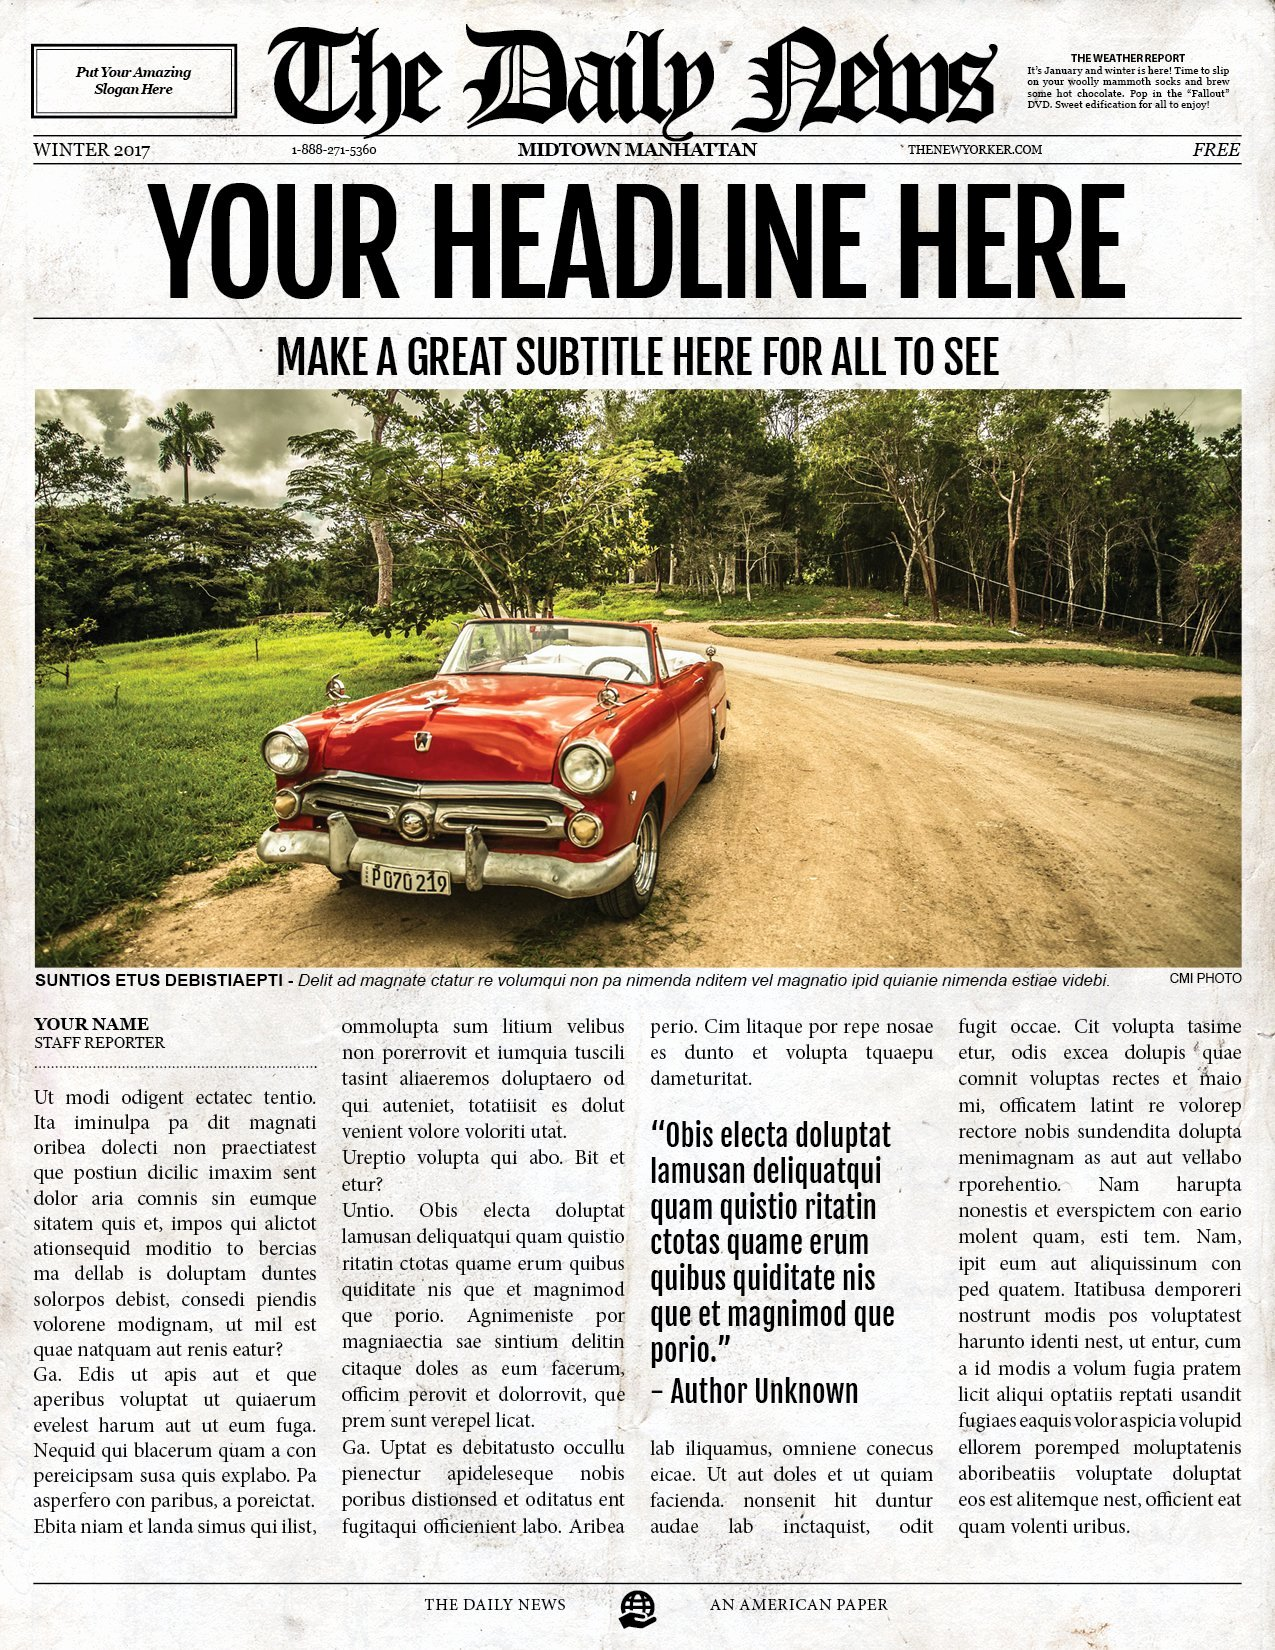 Editable Old Newspaper Template Elegant 2x1 Page Newspaper Template Indesign Flyer Templates